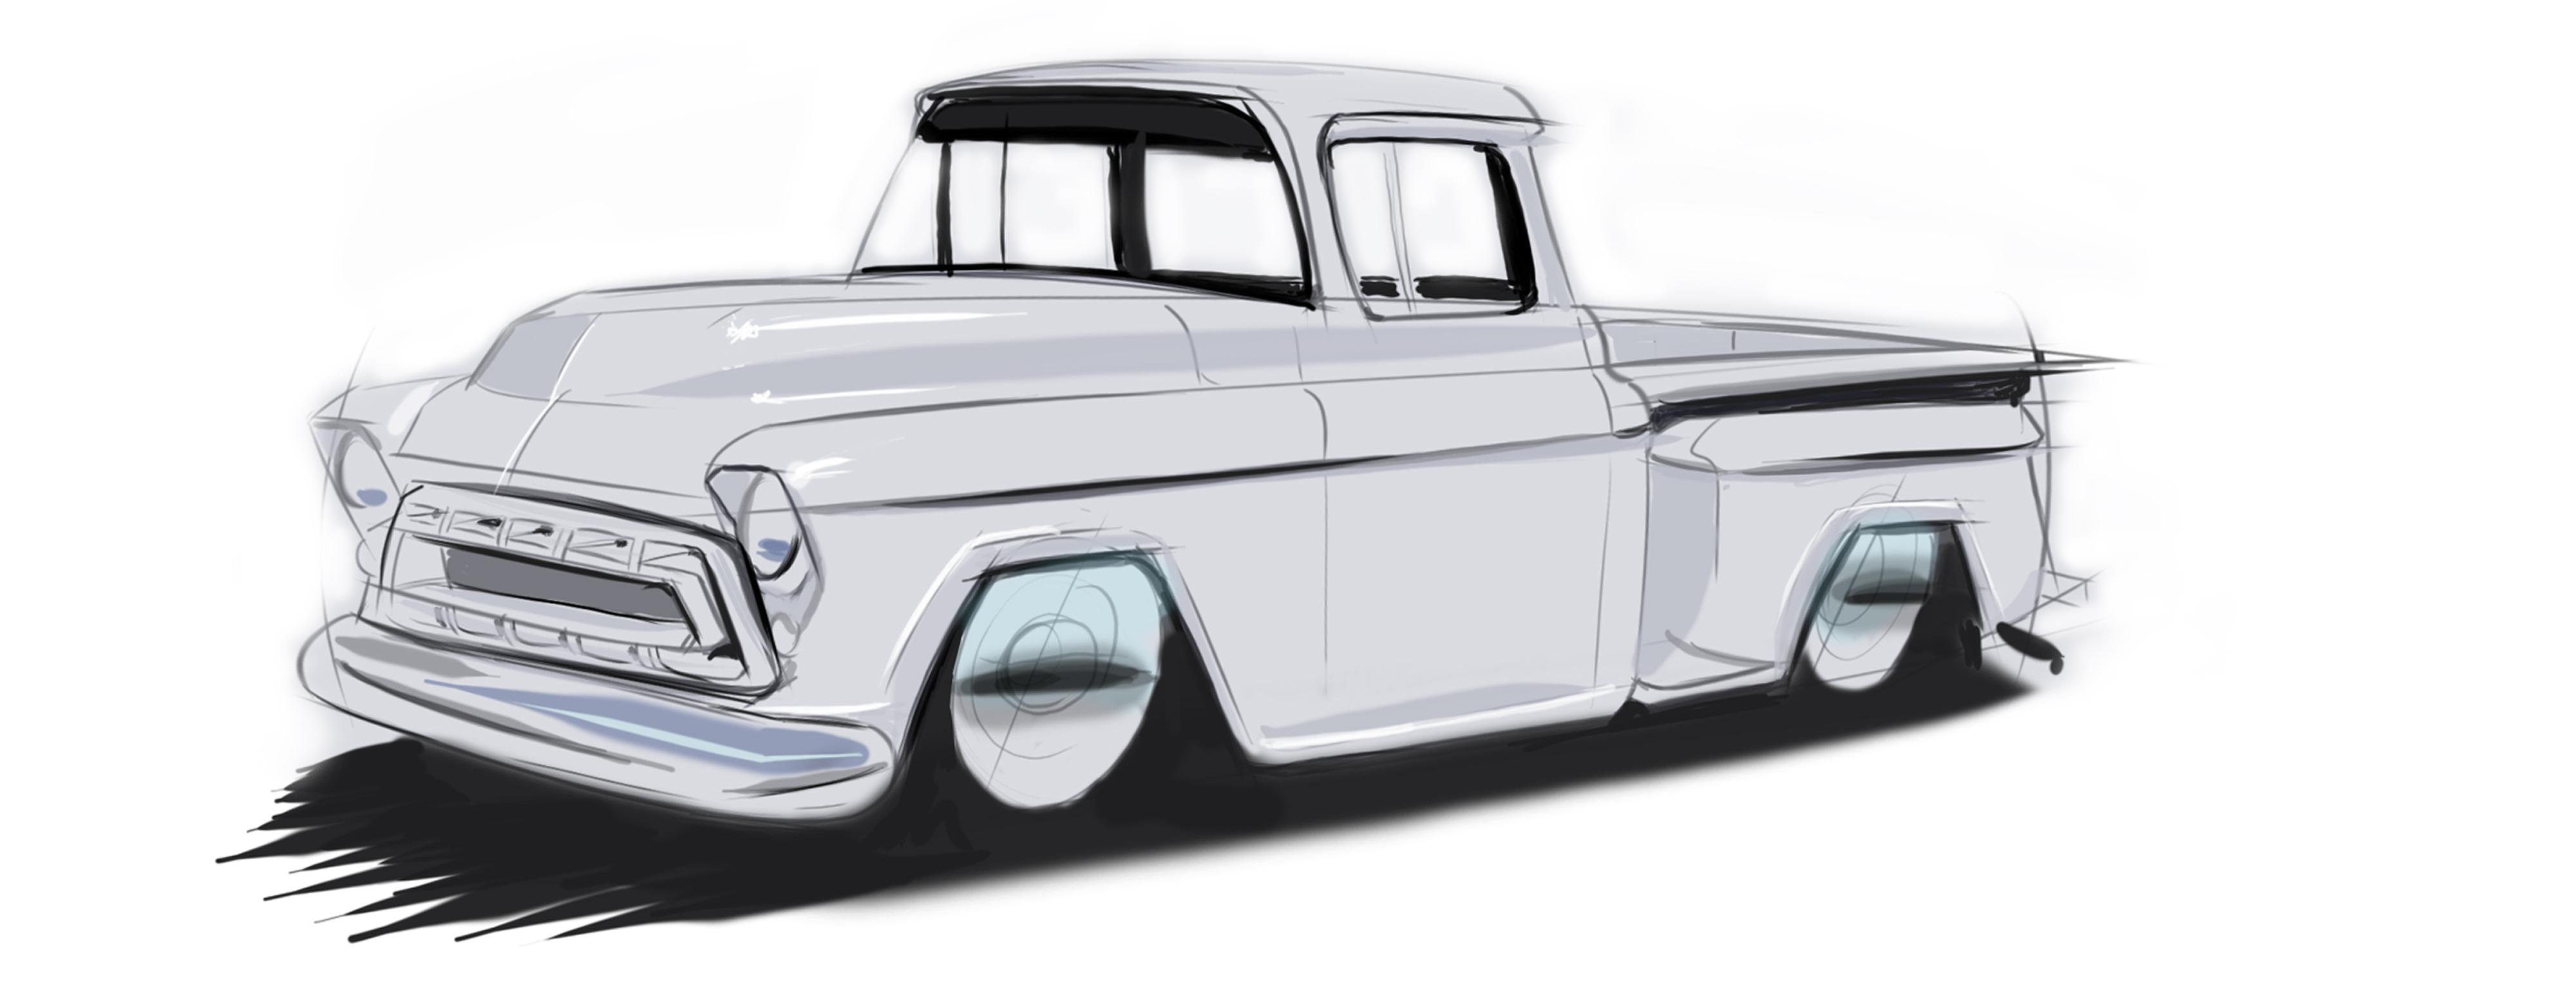 1957 Chevrolet Step Side Truck Hand Drawn Digtal Car Sketch Rendering